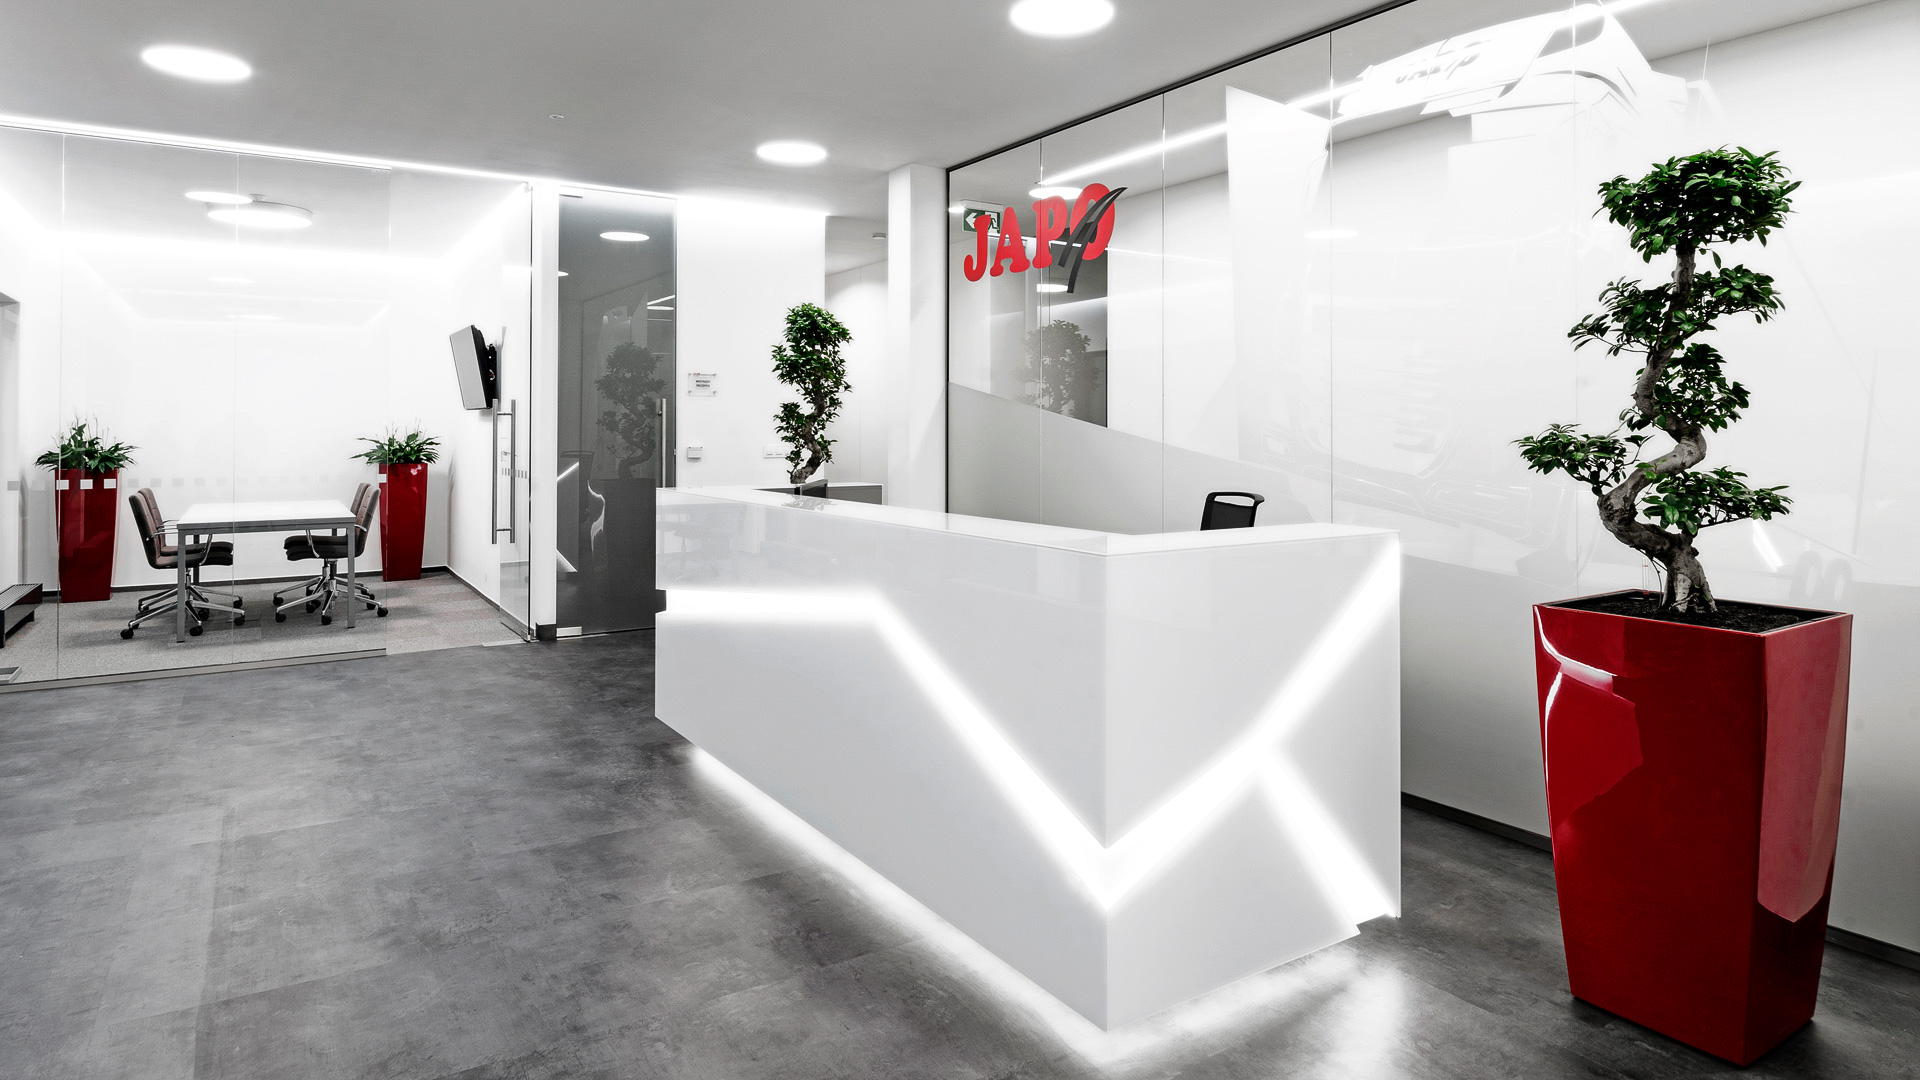 Architektura - interiér, recepce